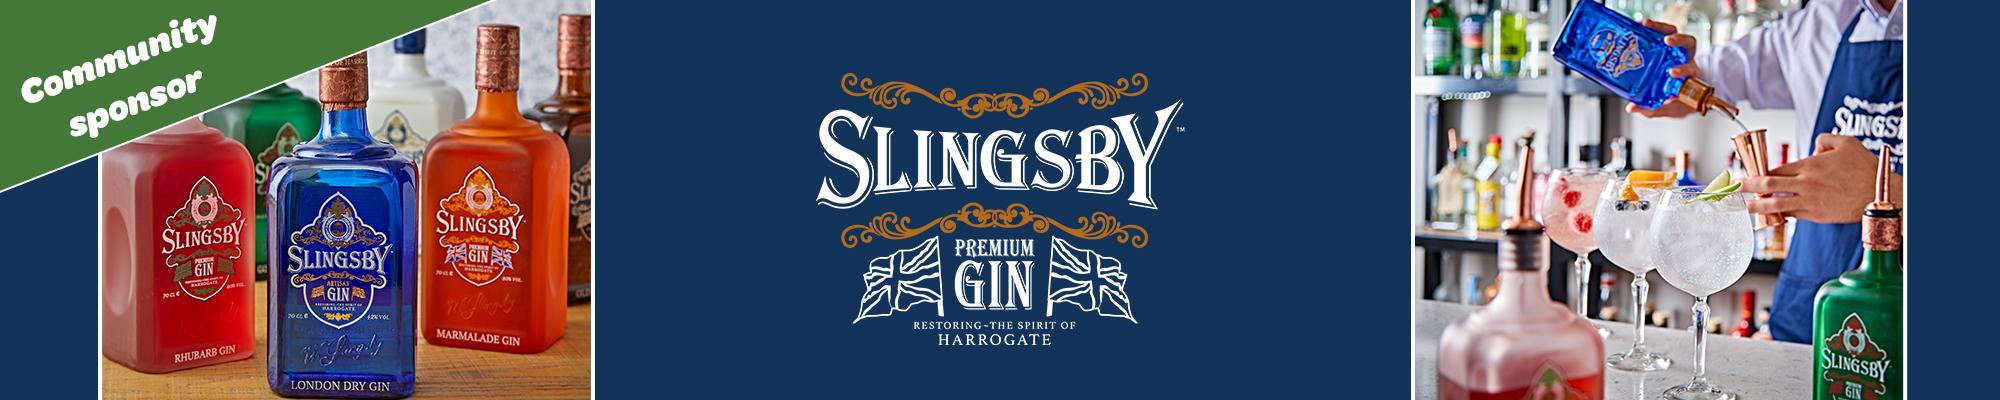 Slingsby_gin